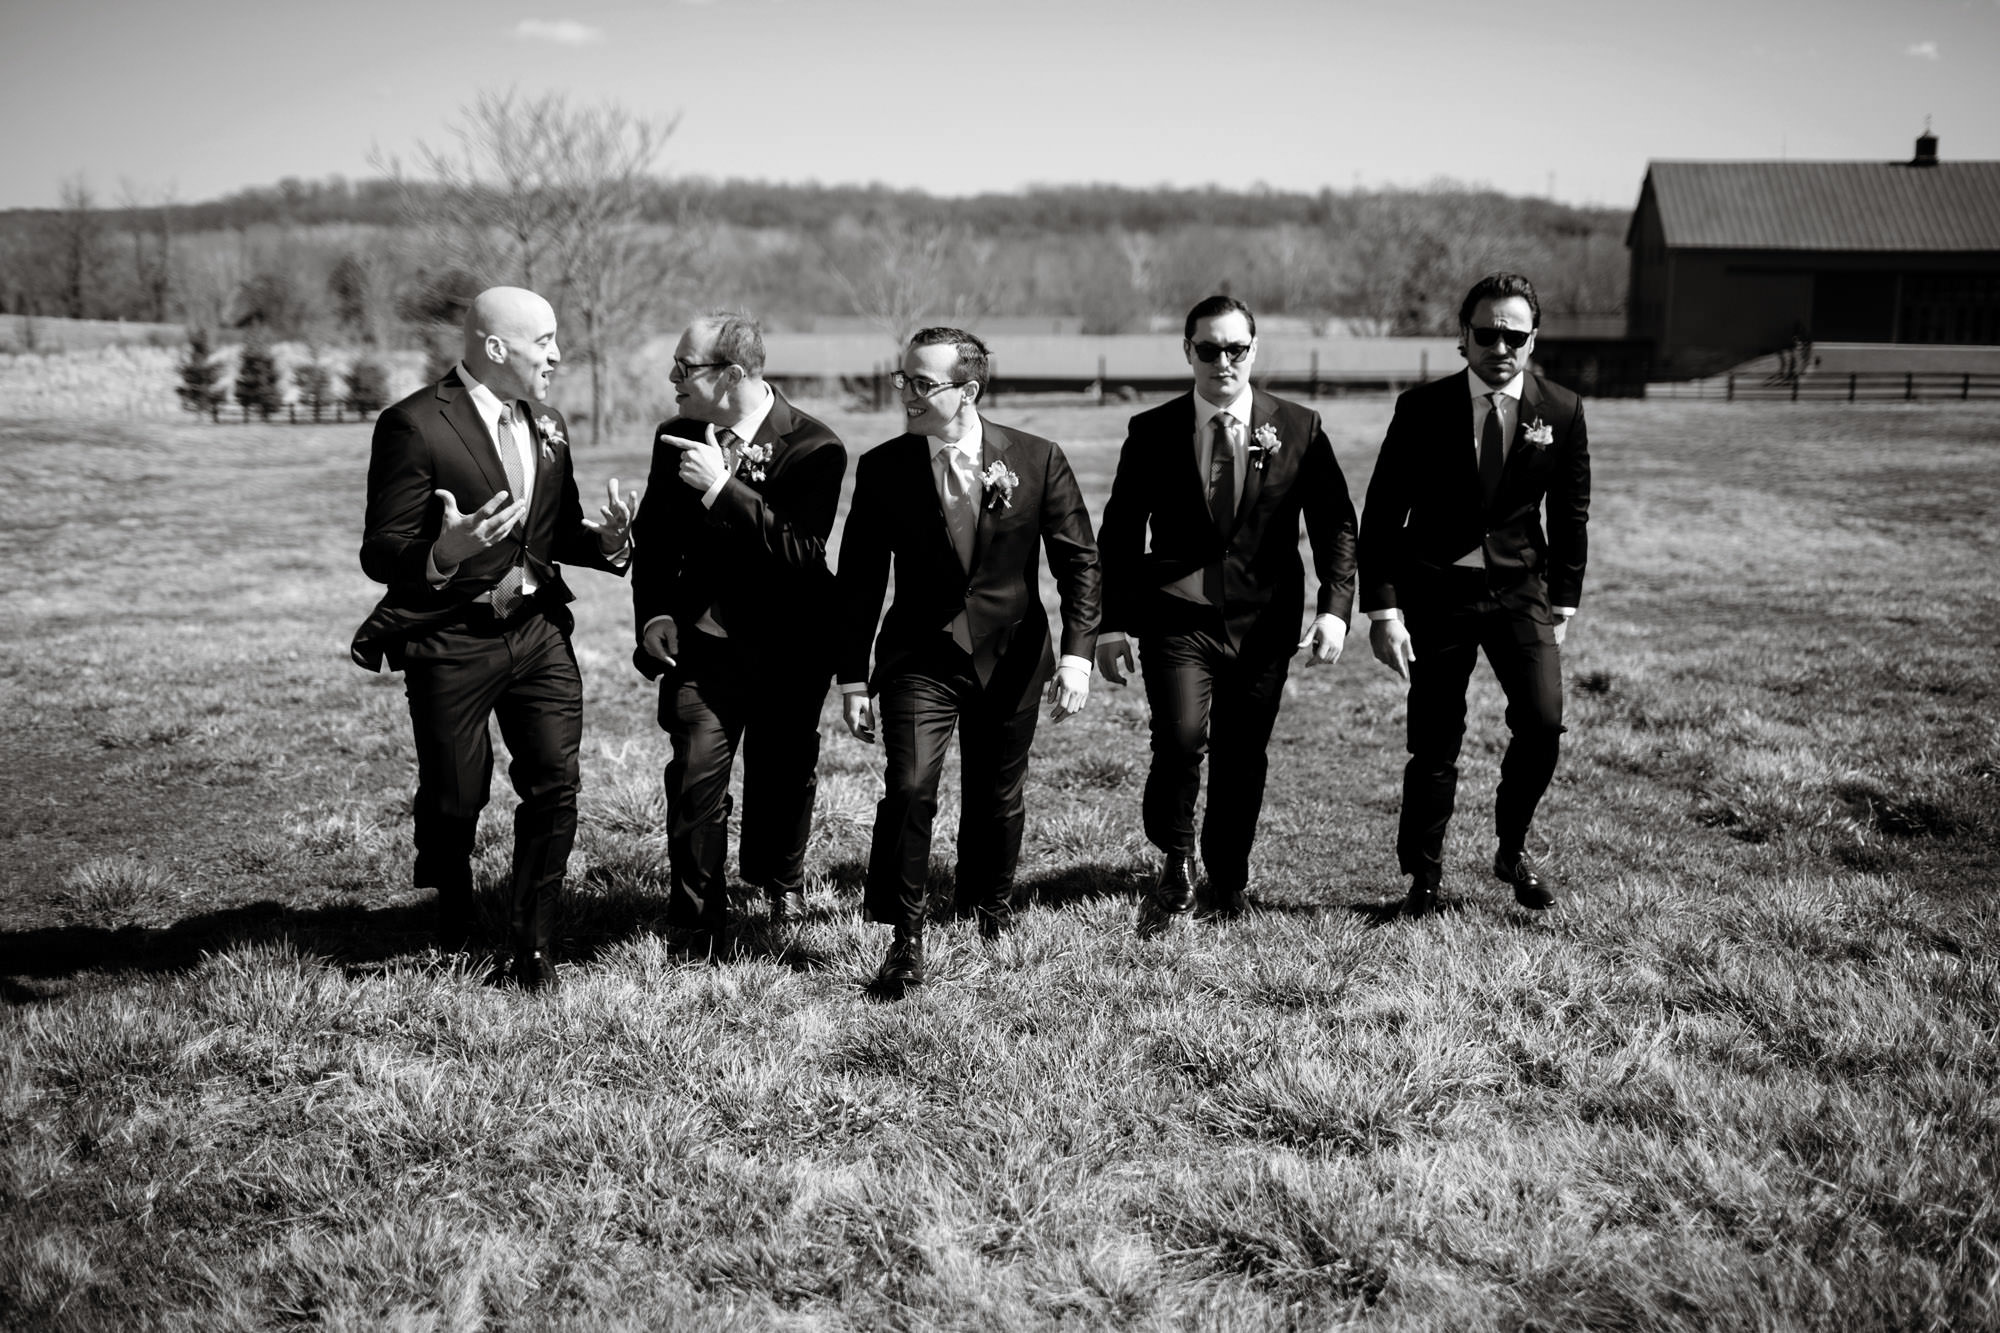 The groomsman walk through a field on the wedding day.